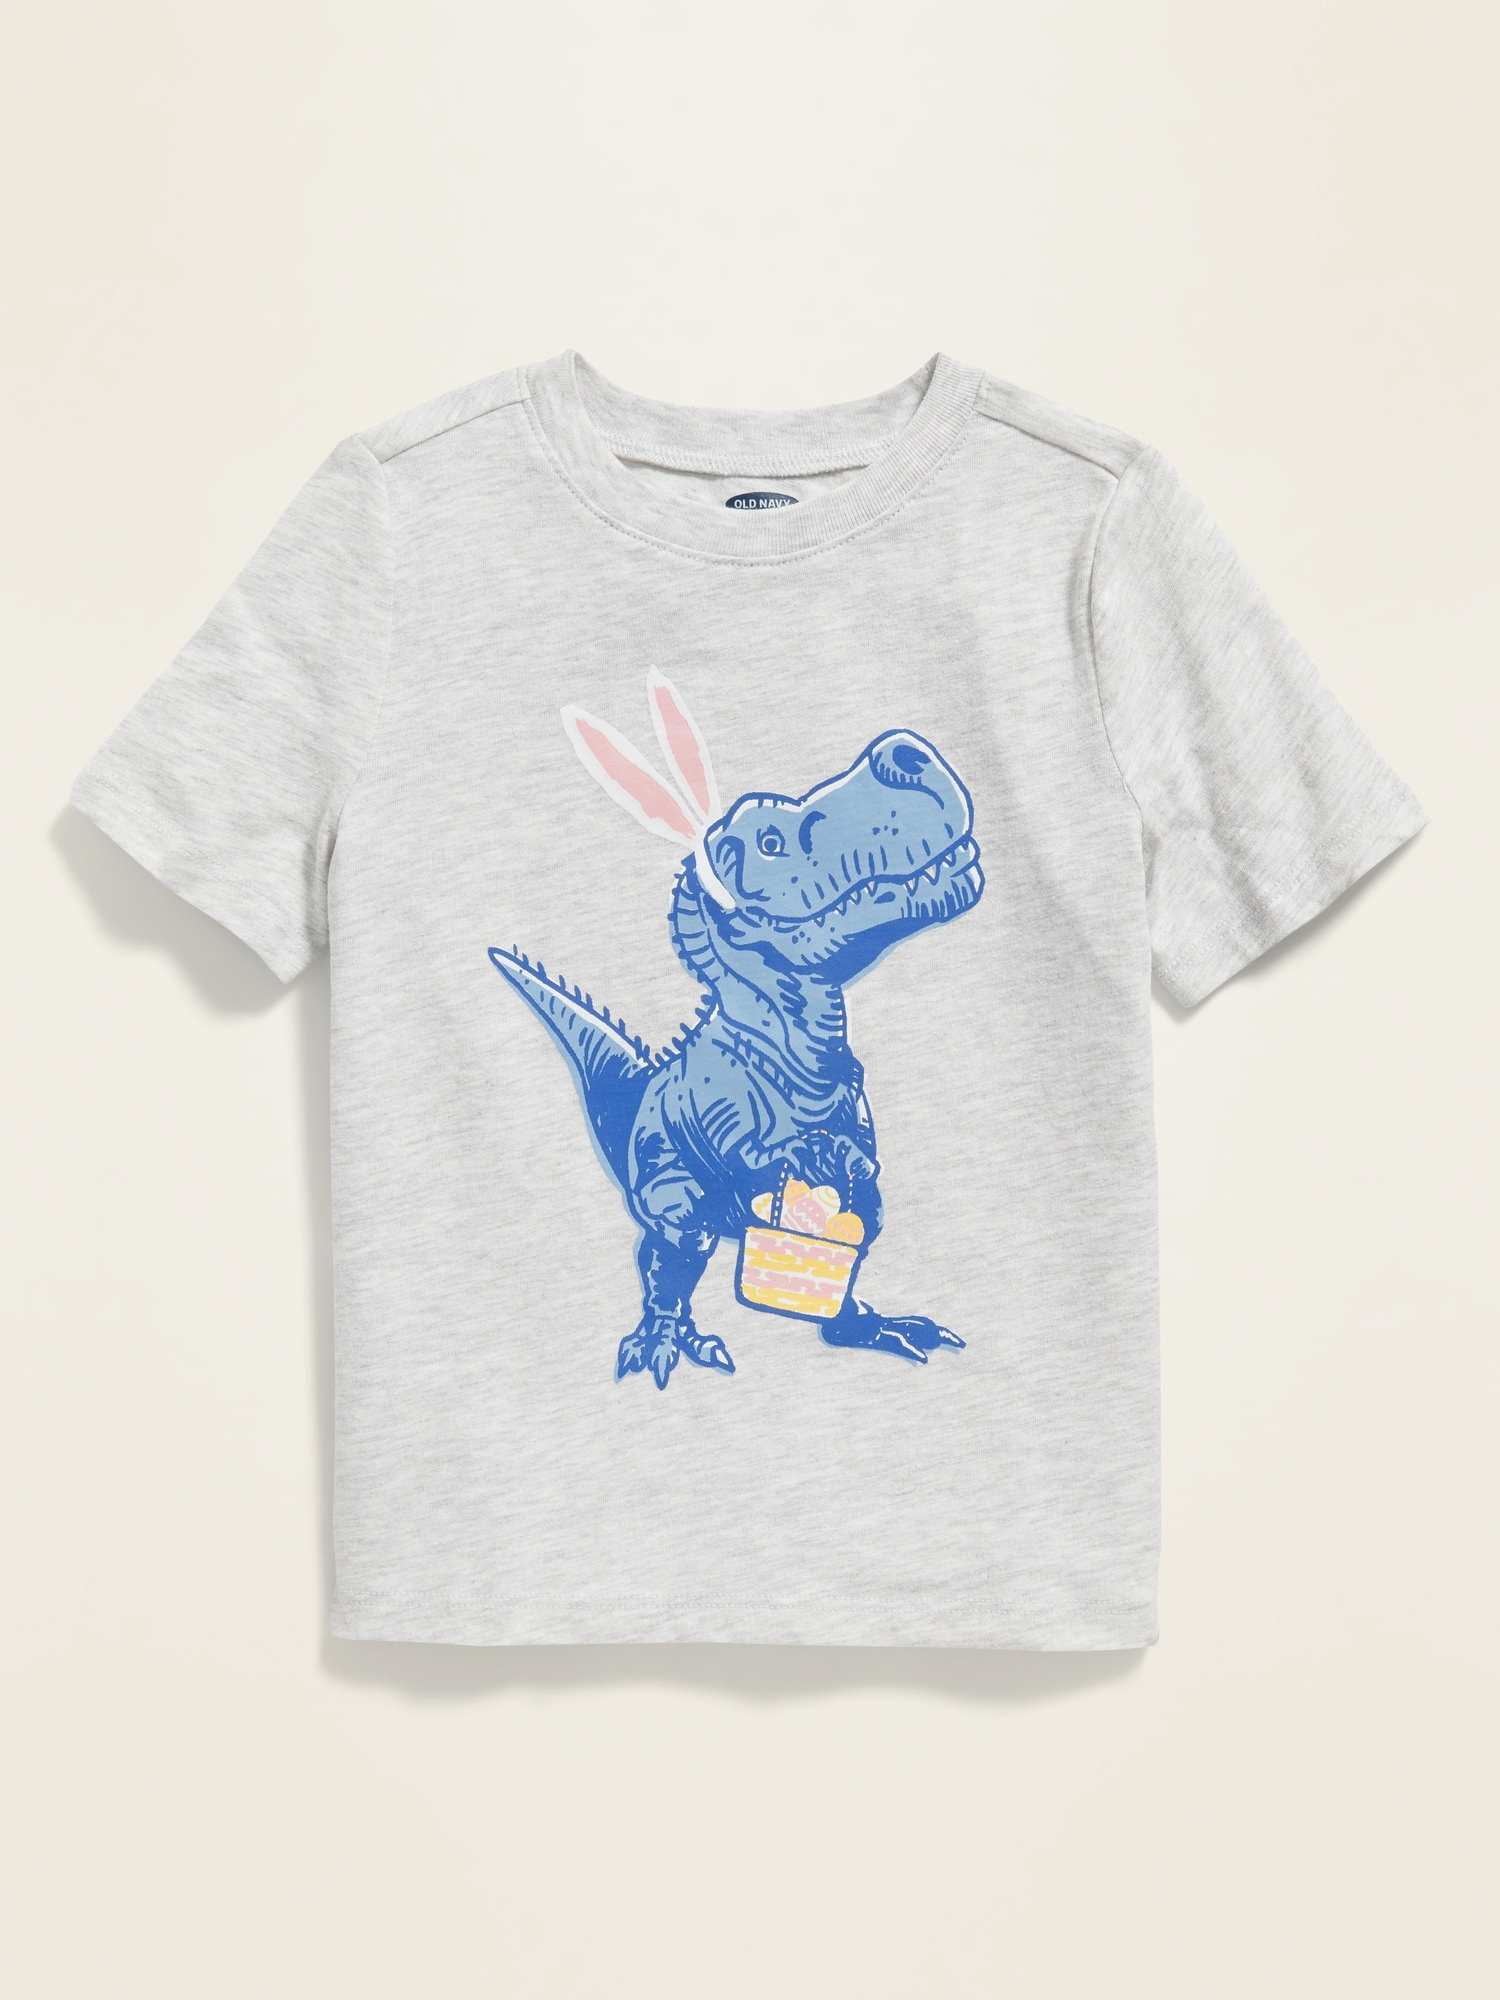 Boys Short Sleeve T-Shirts Crew-Neck I Love Dinosaurs